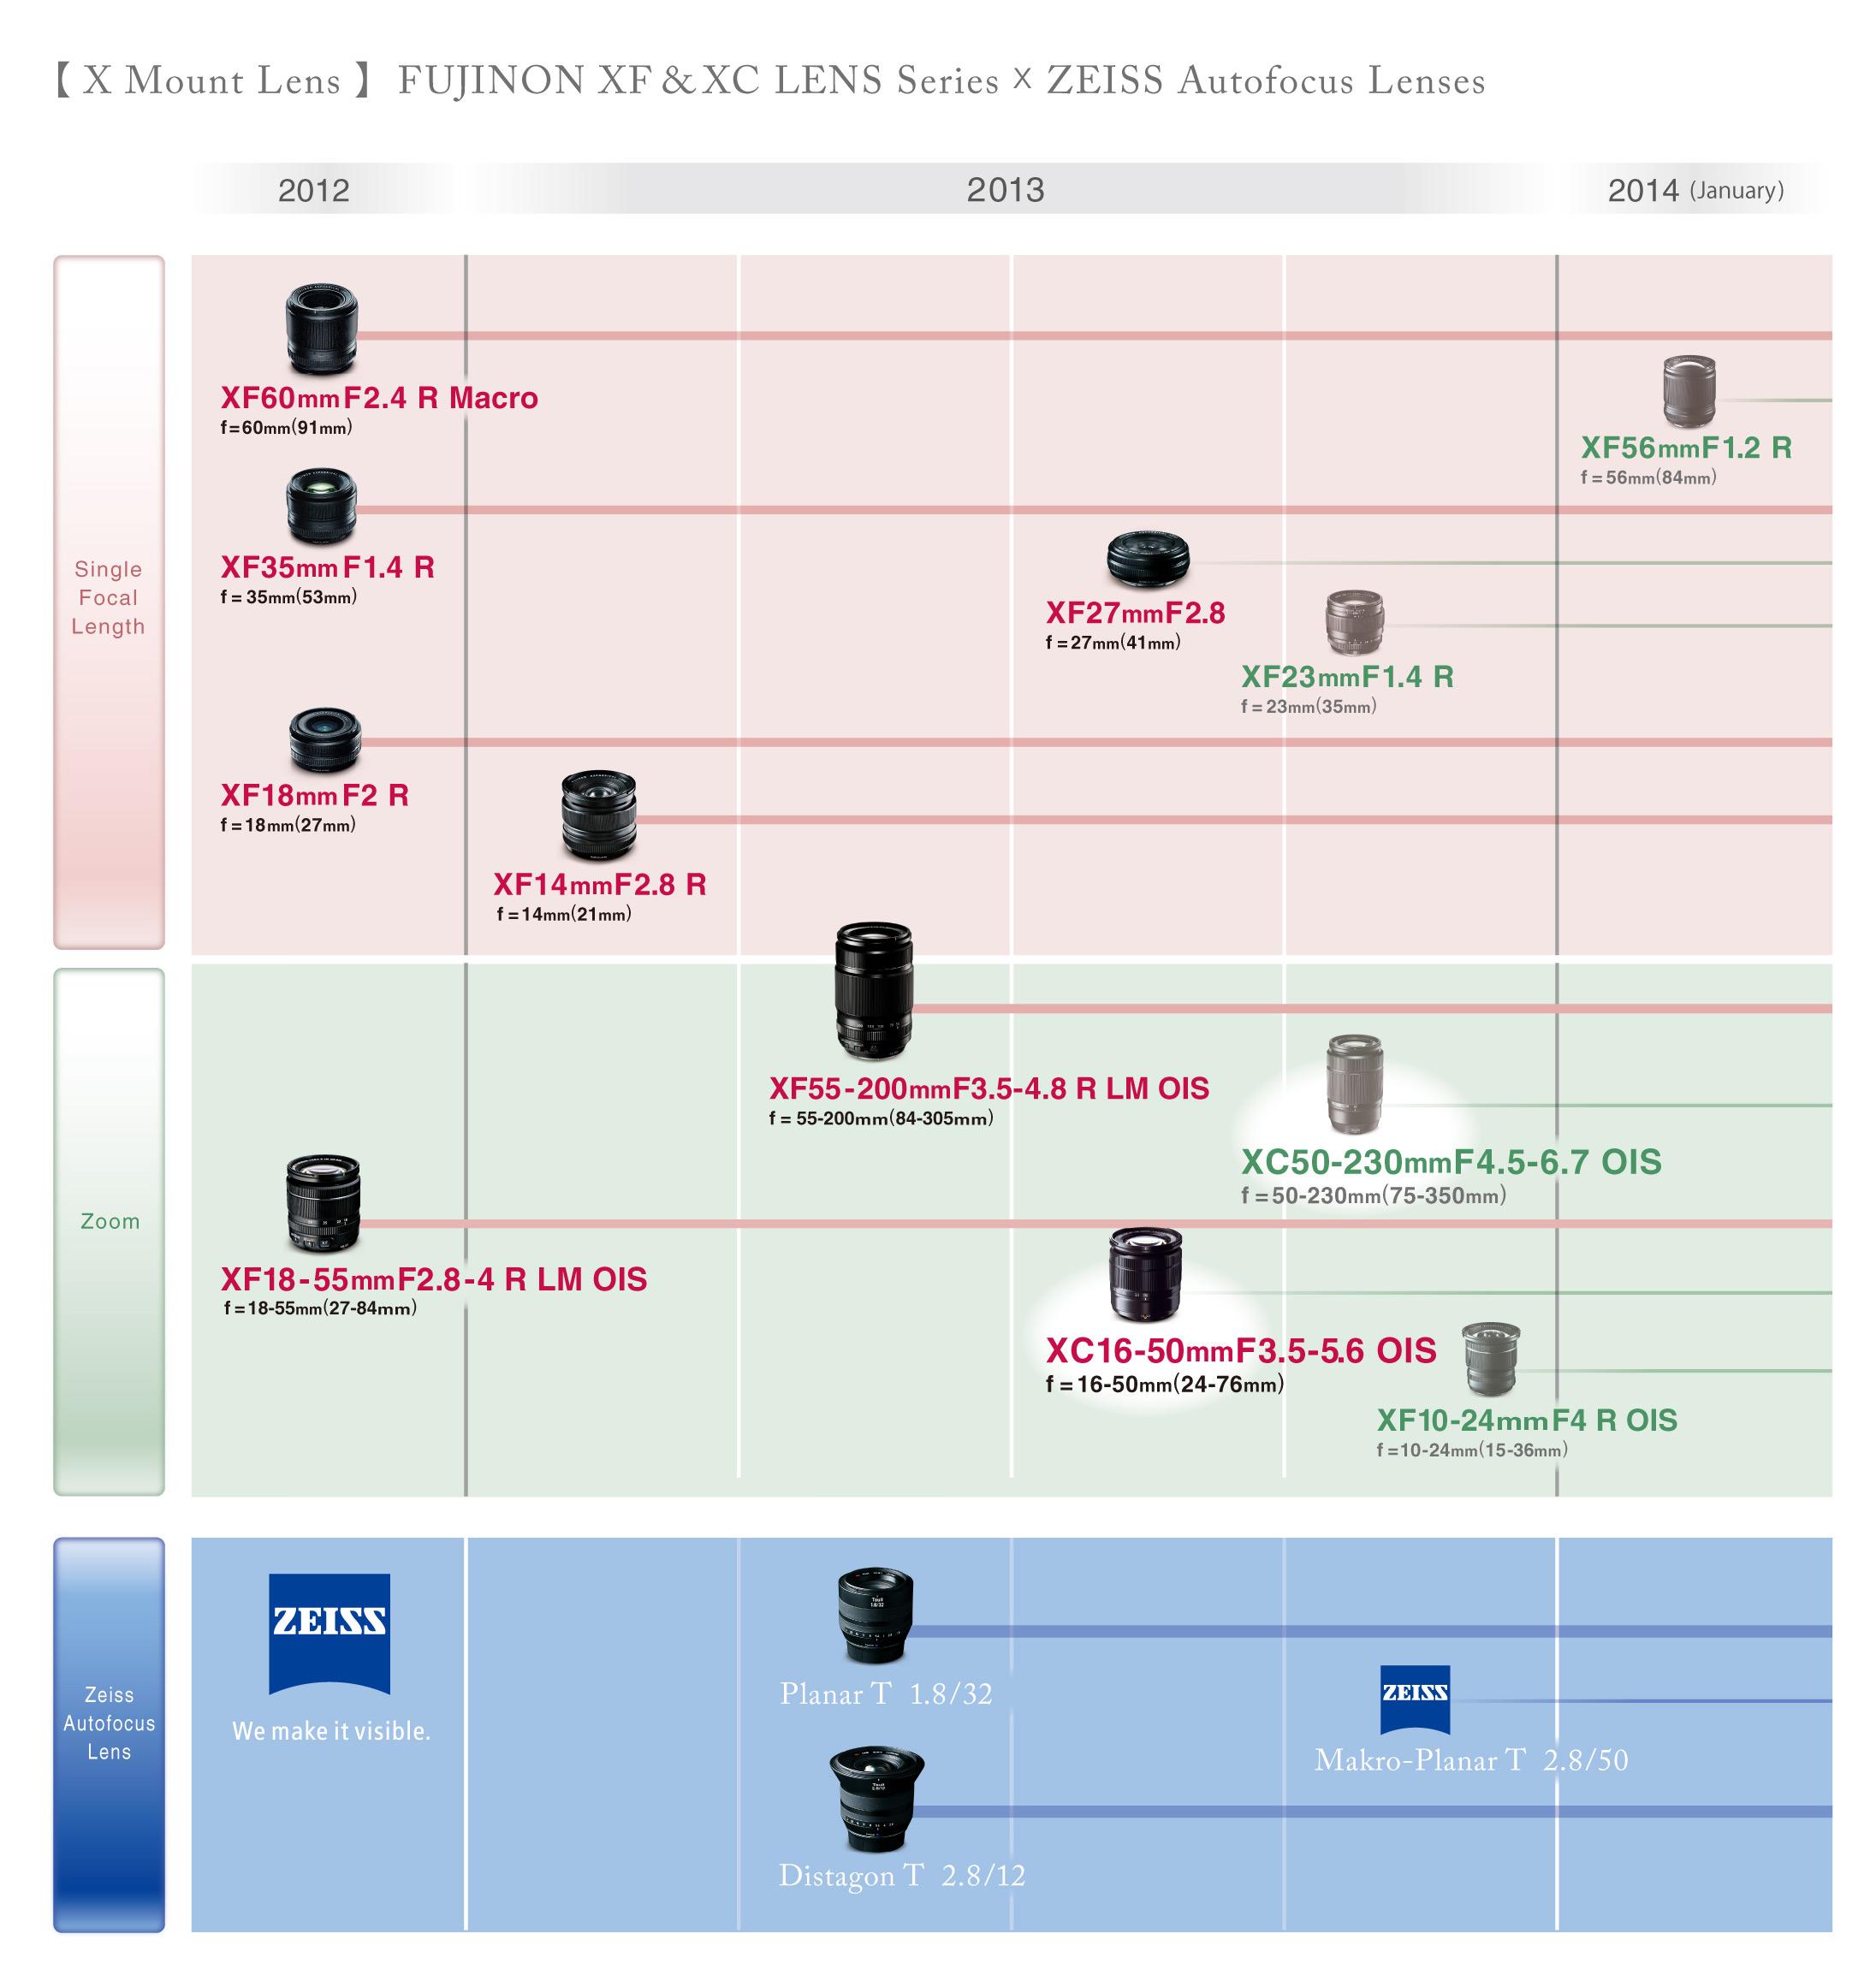 Fujifilm adds XC50230mm F4567 OIS to Xmount lens roadmap